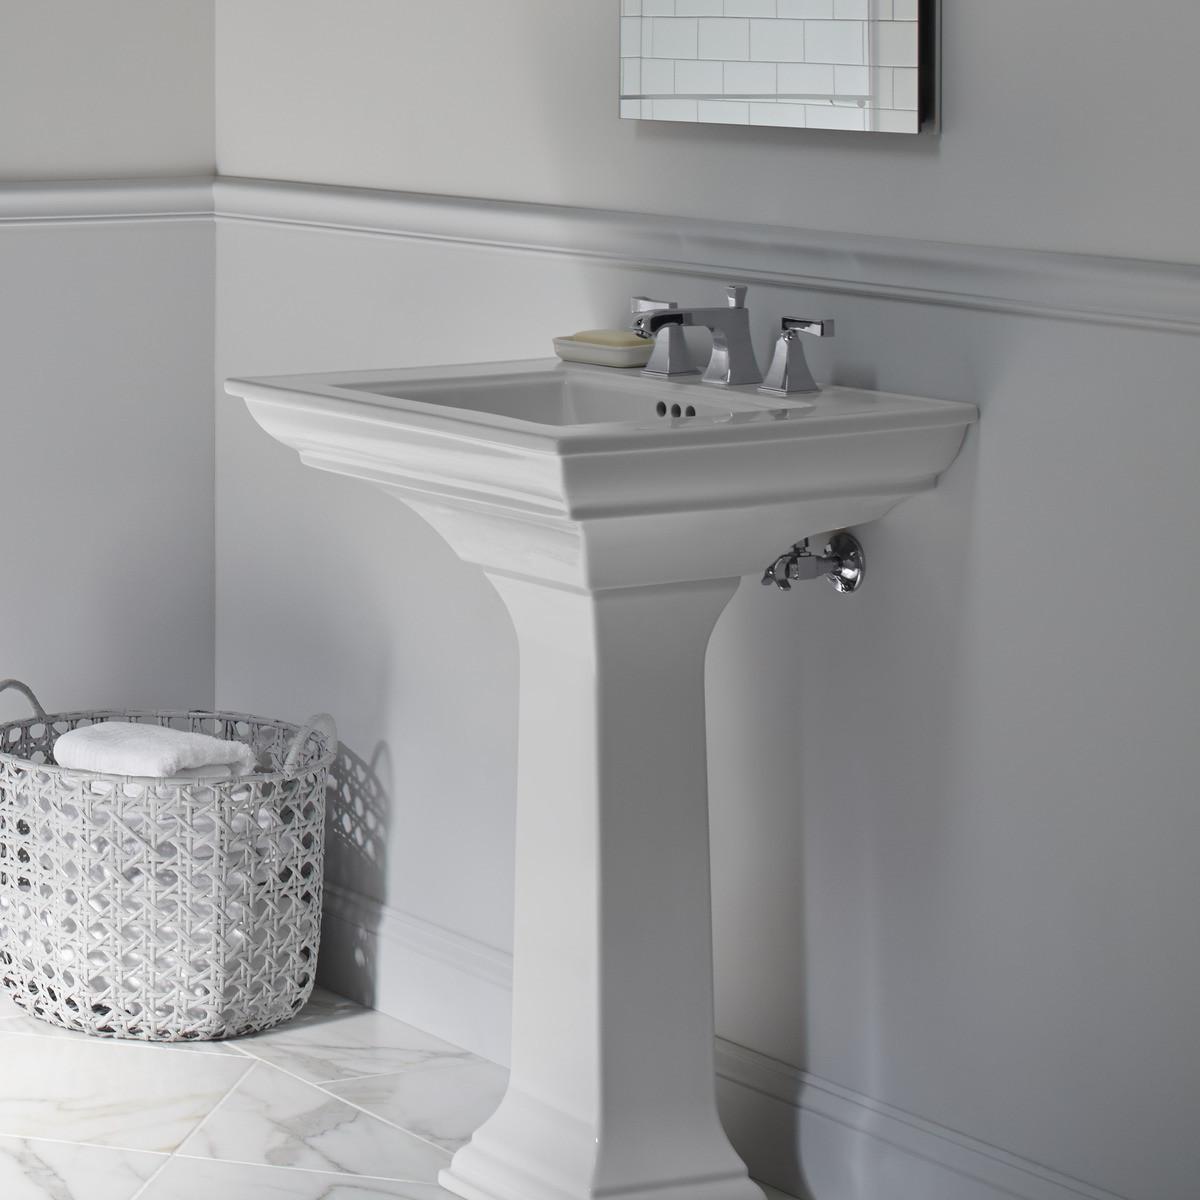 Best ideas about Bathroom Pedestal Sink . Save or Pin Kohler Memoirs Bathroom Sink Pedestal & Reviews Now.